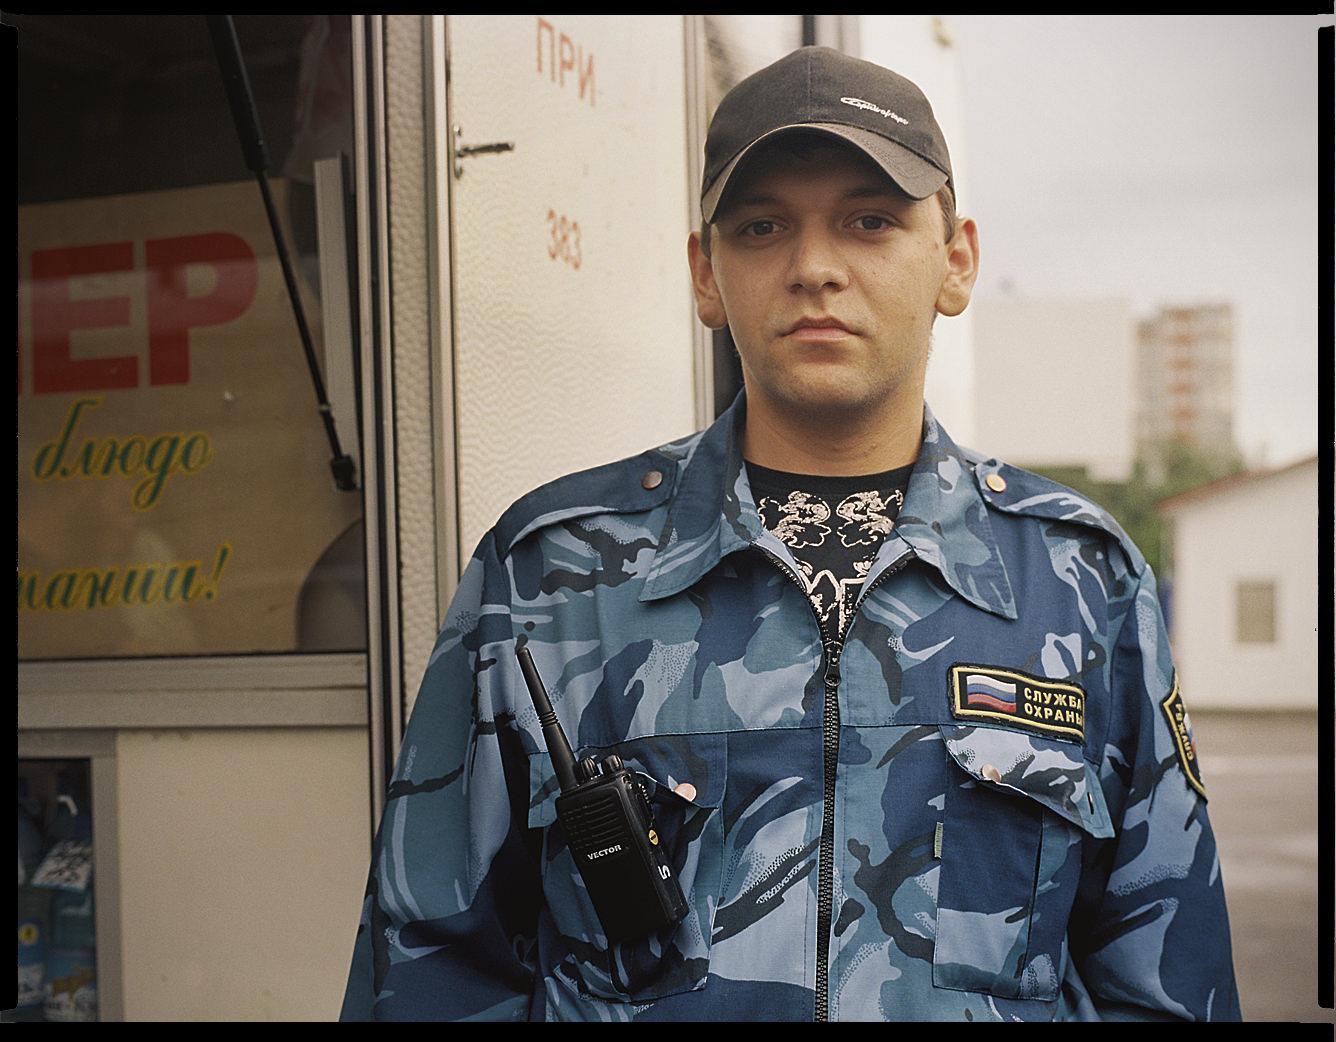 MediumFormatPatrikWallner_Krasnoyarsk_RussianCopPortraitLOWQ